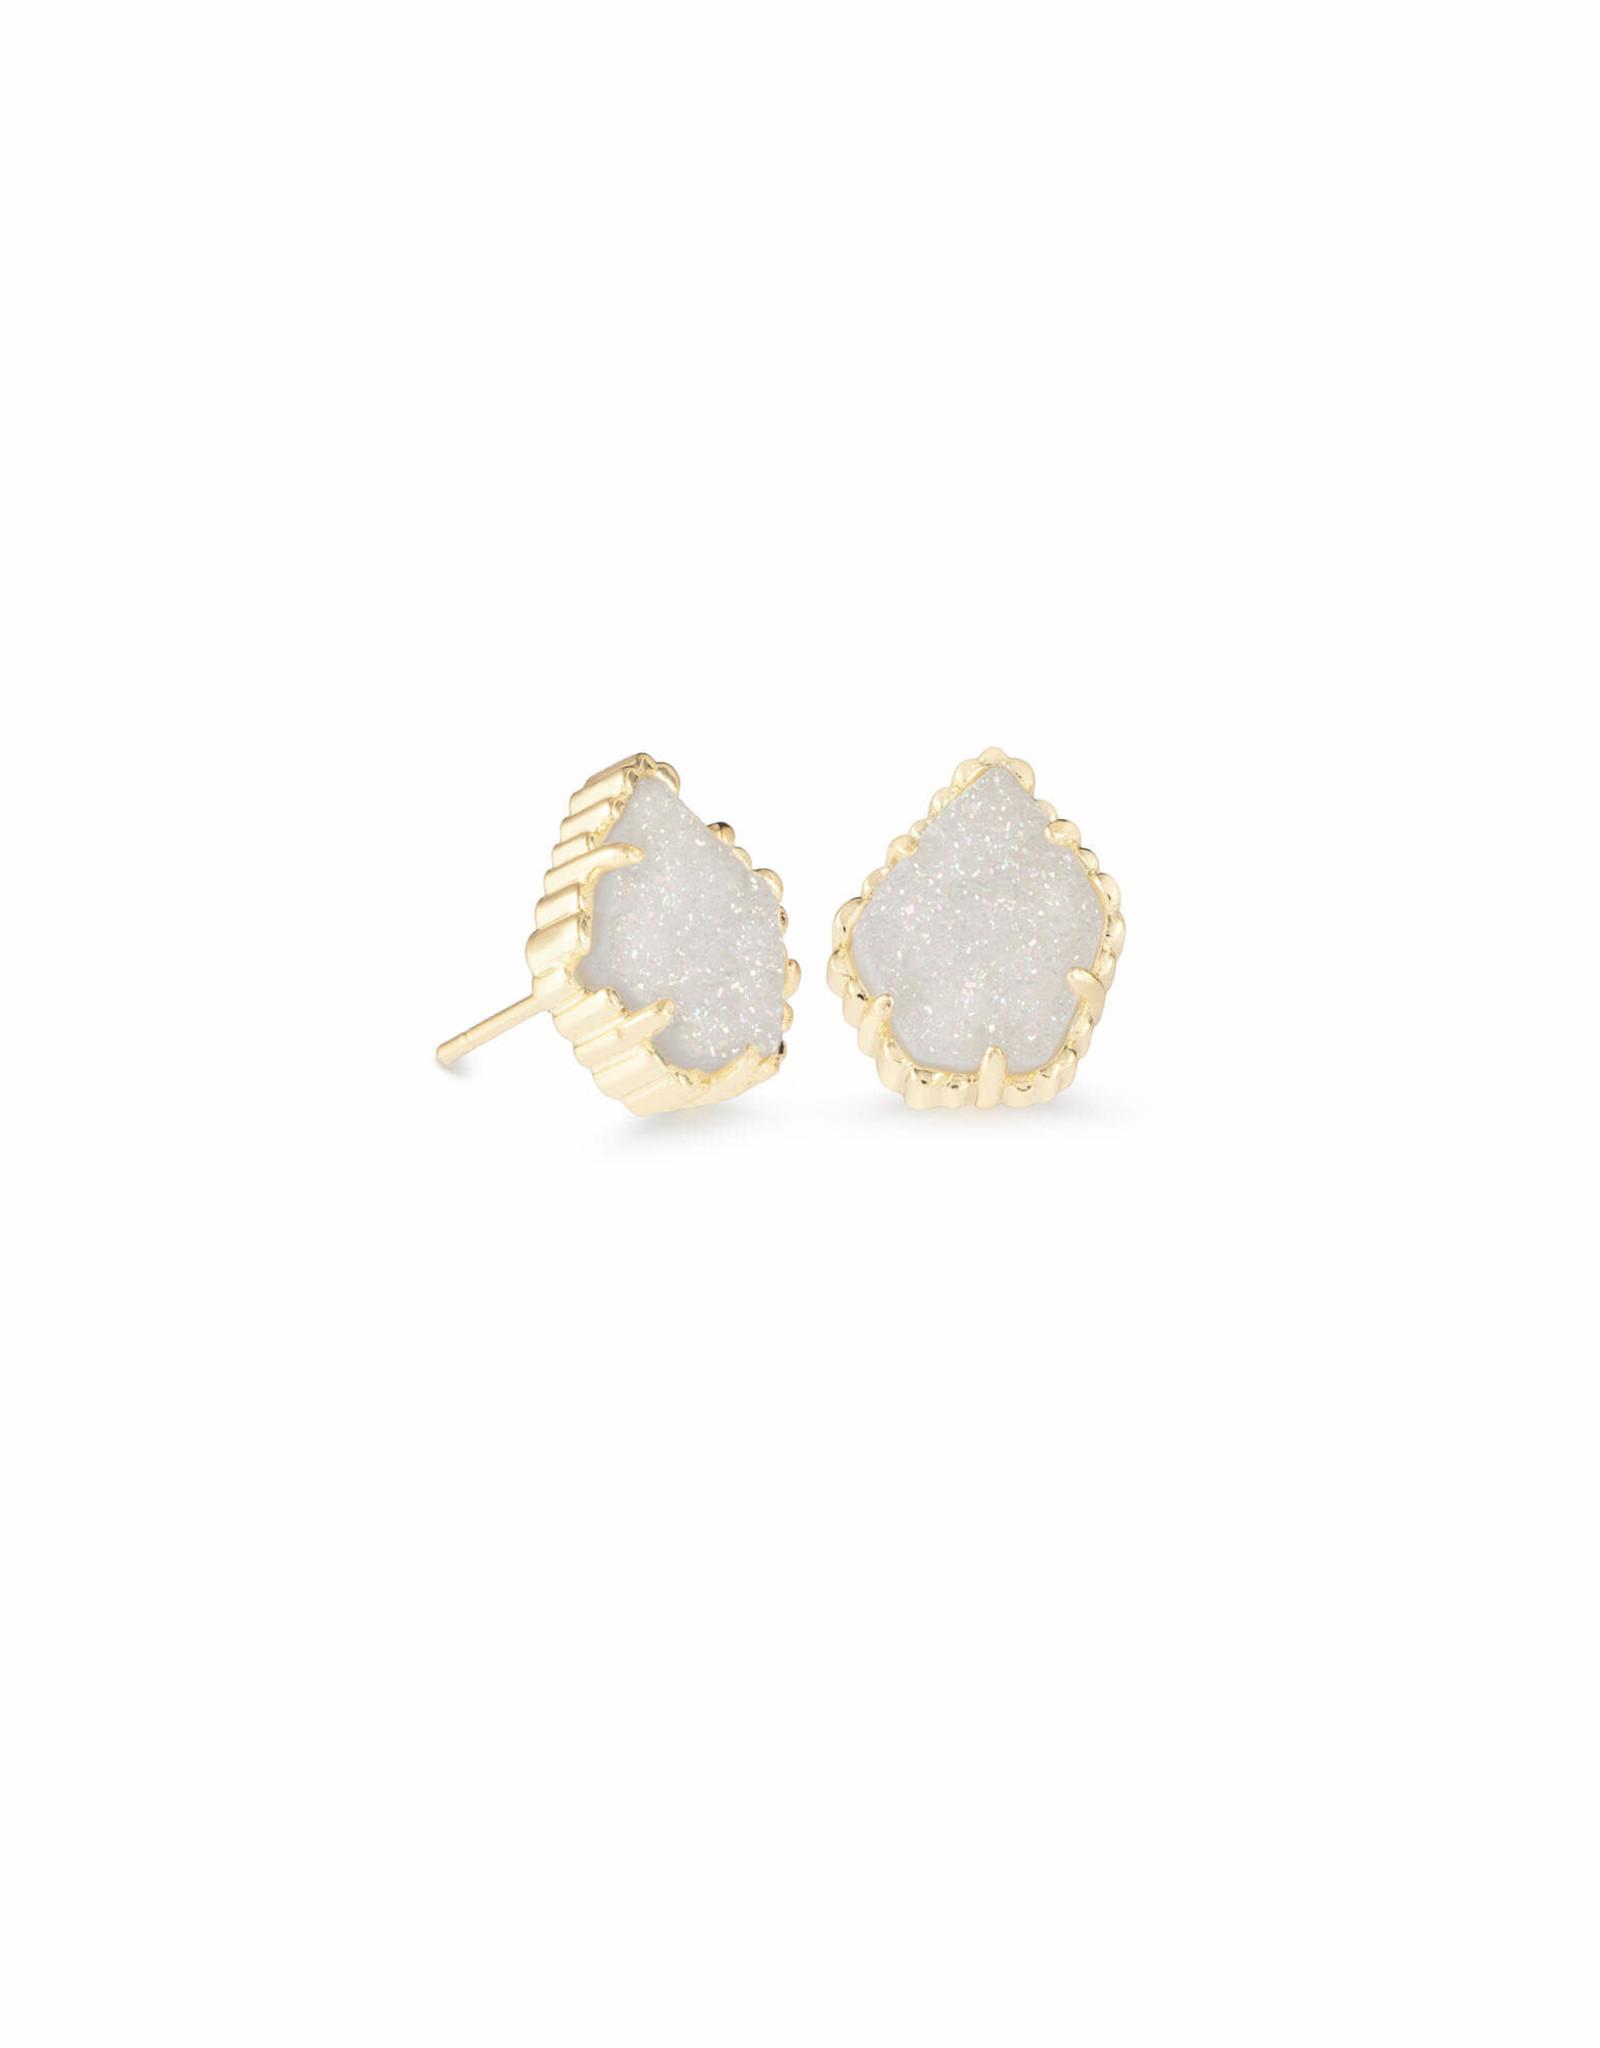 Kendra Scott Tessa Earring - Iridescent Drusy/Gold